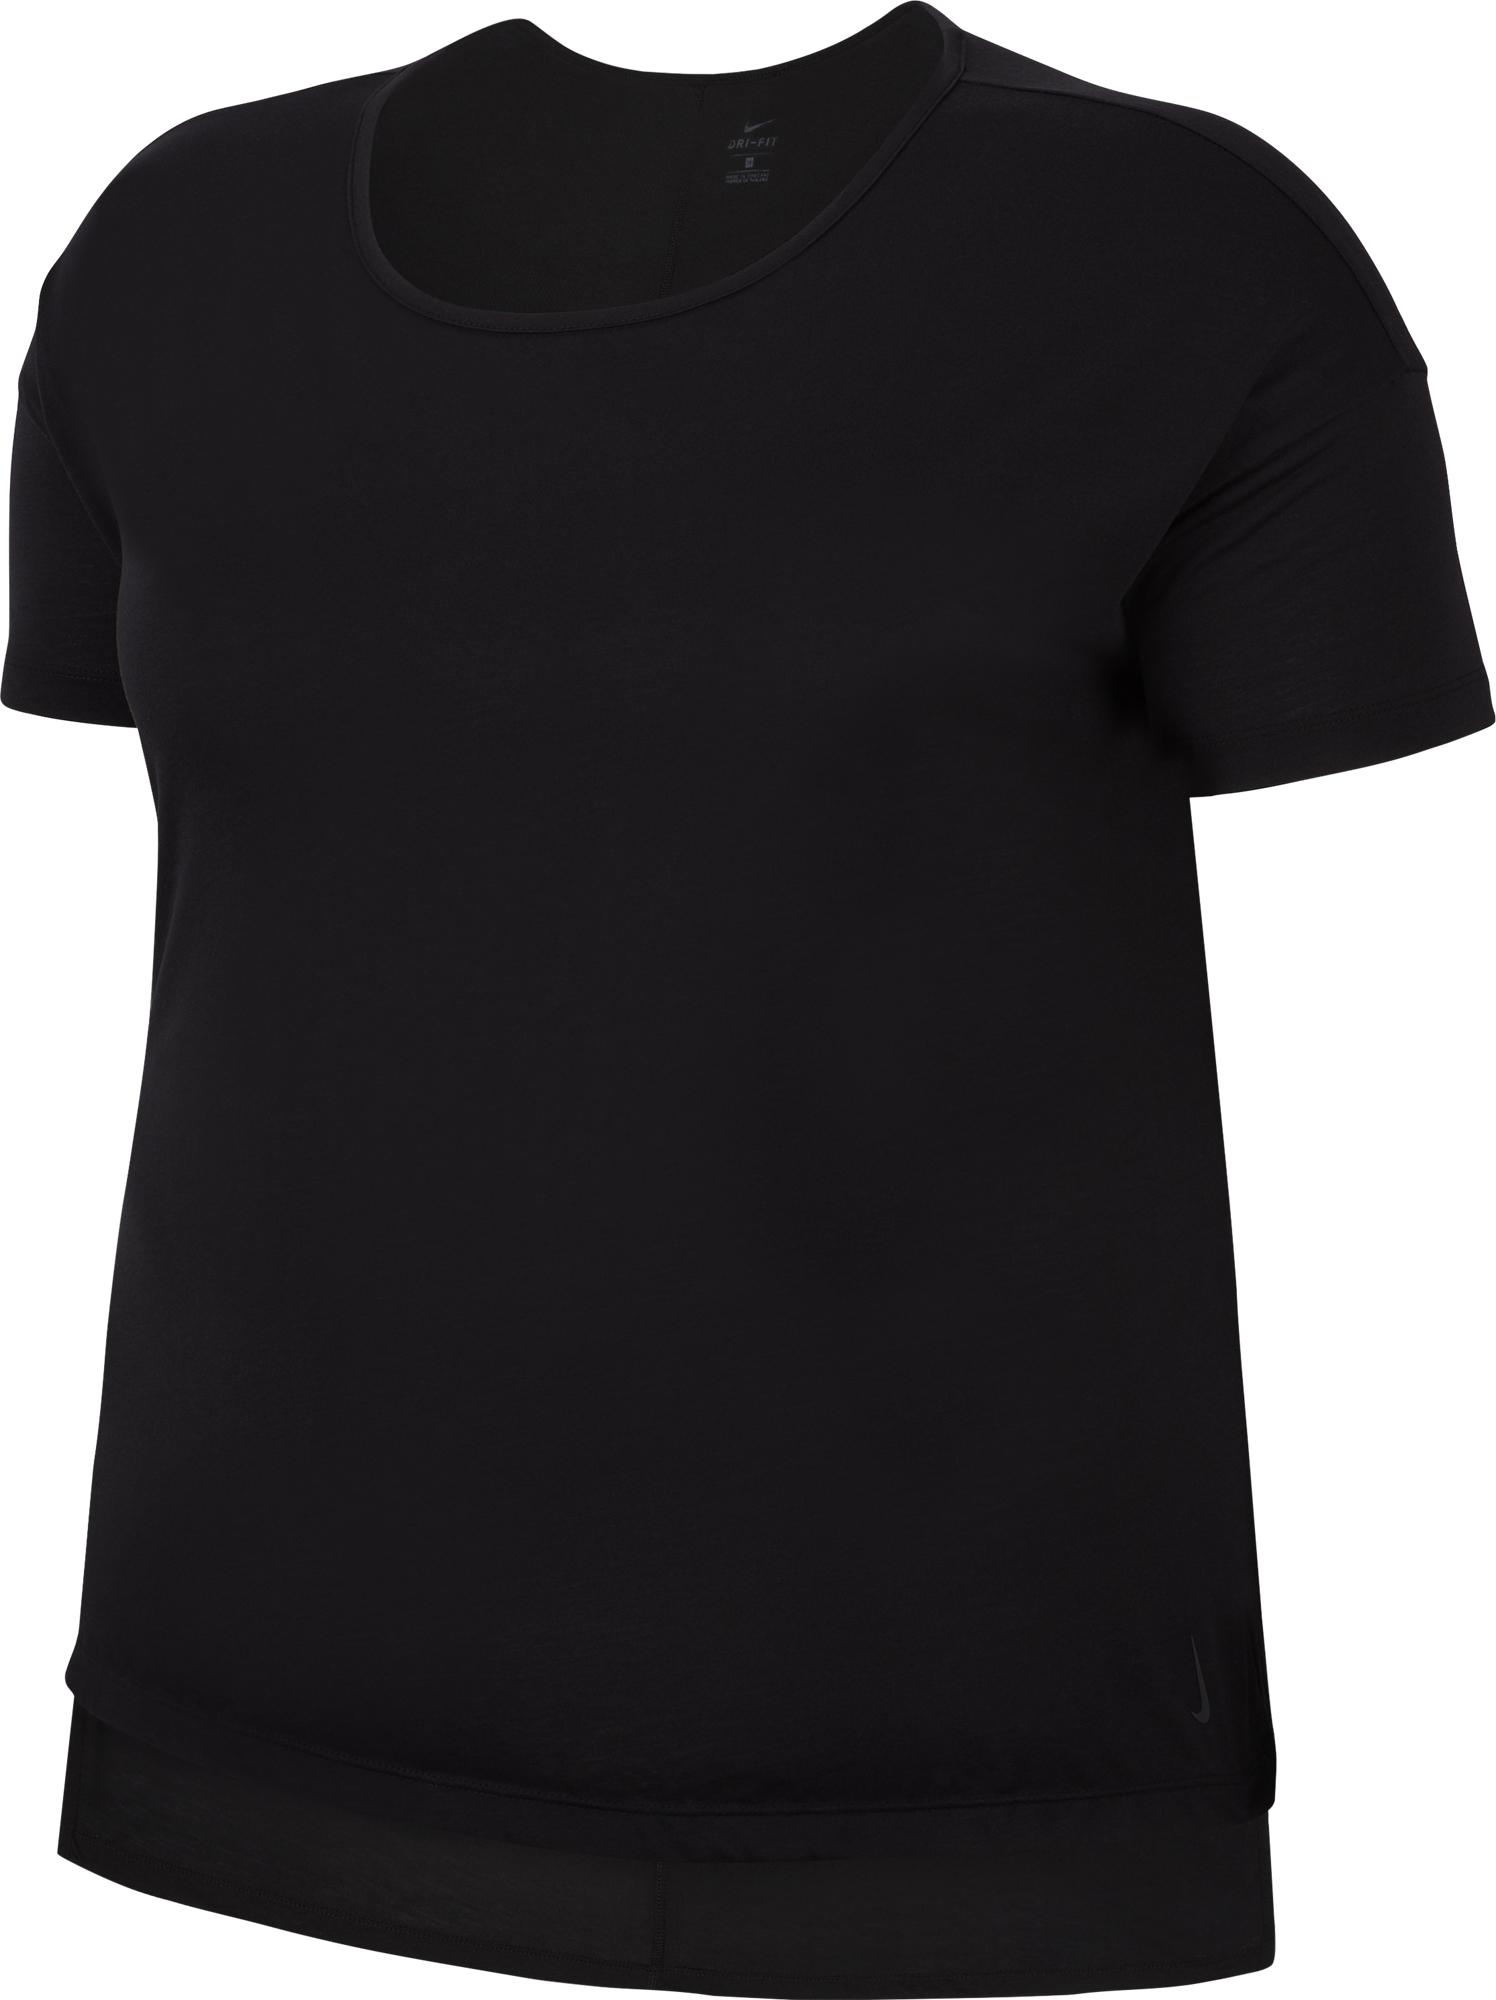 Nike Футболка женская Nike, размер 56-58 цена